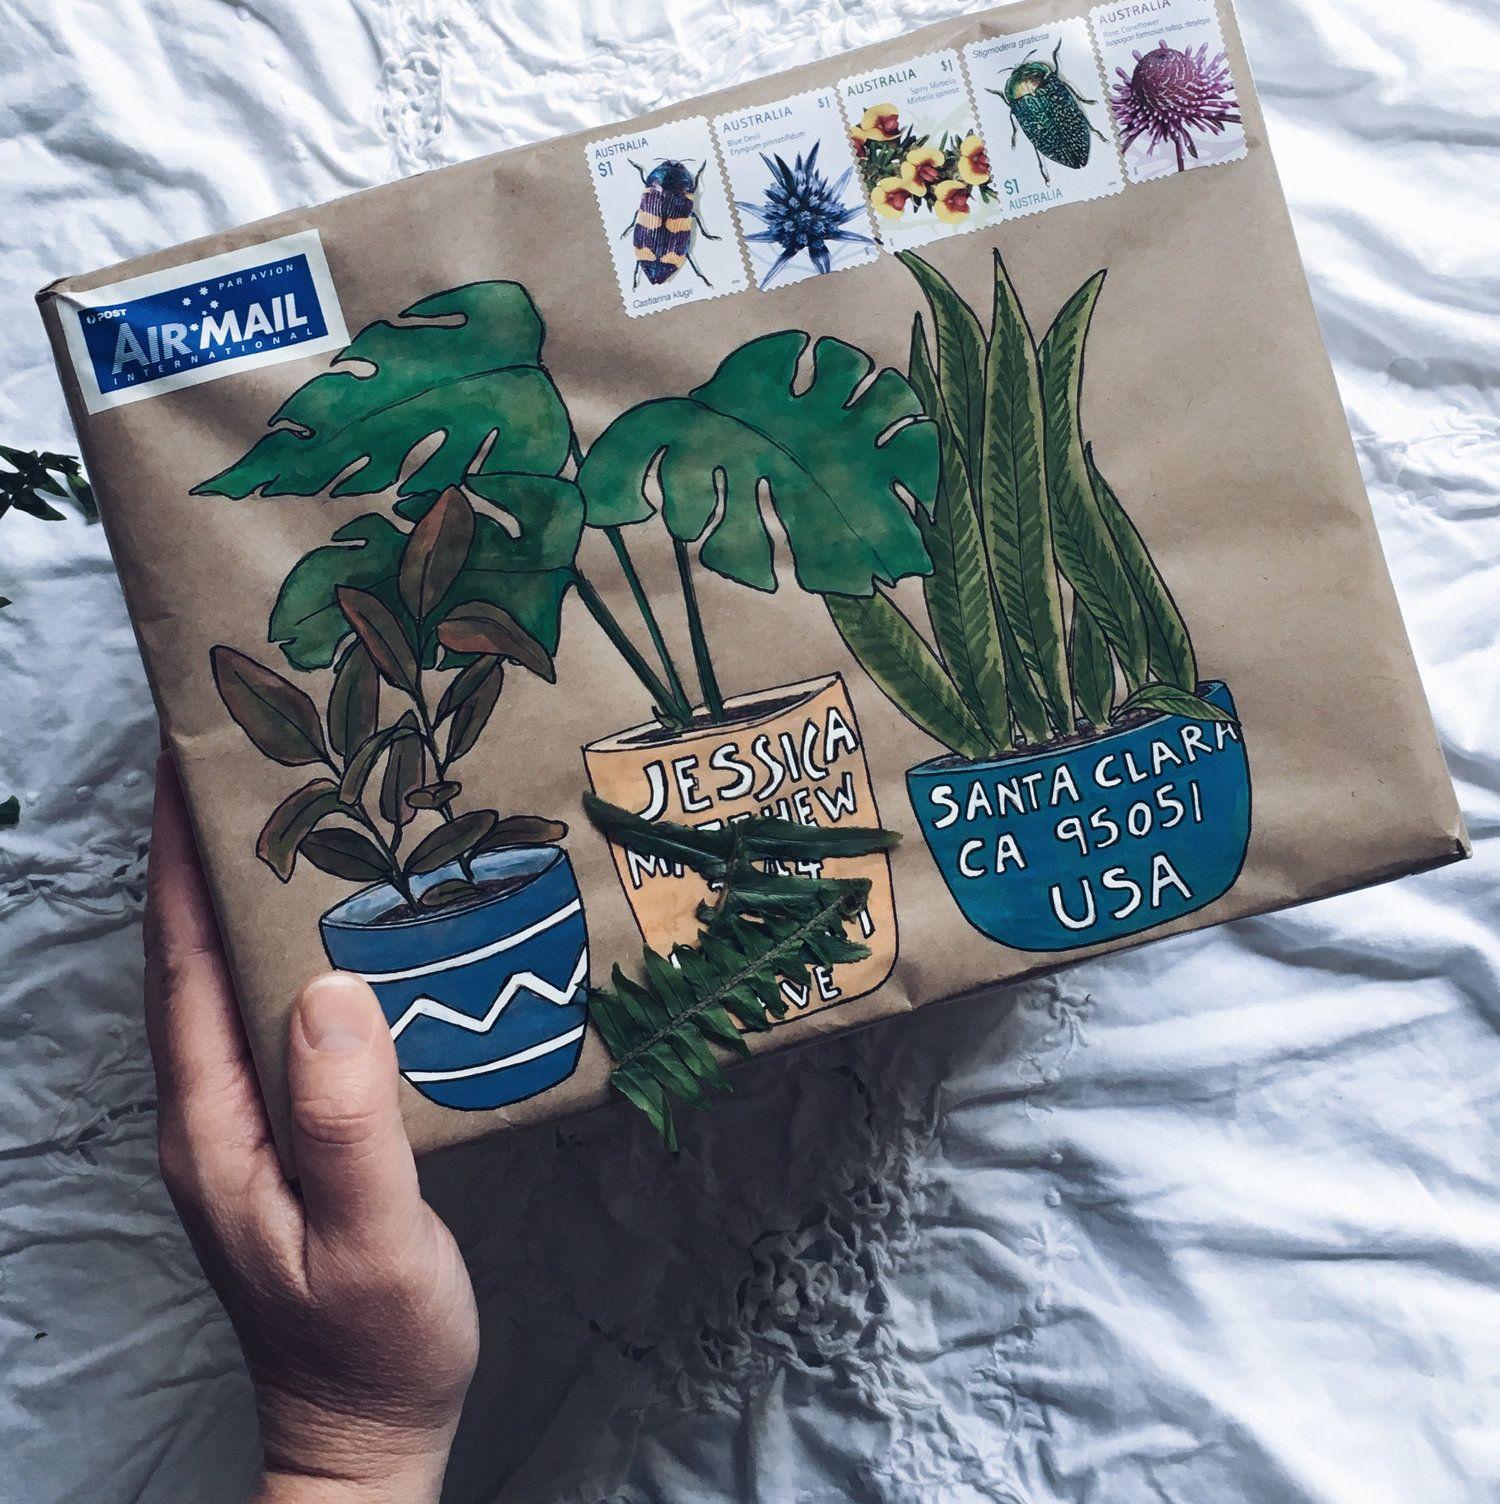 pot plants.jpg Mail art envelopes, Snail mail art